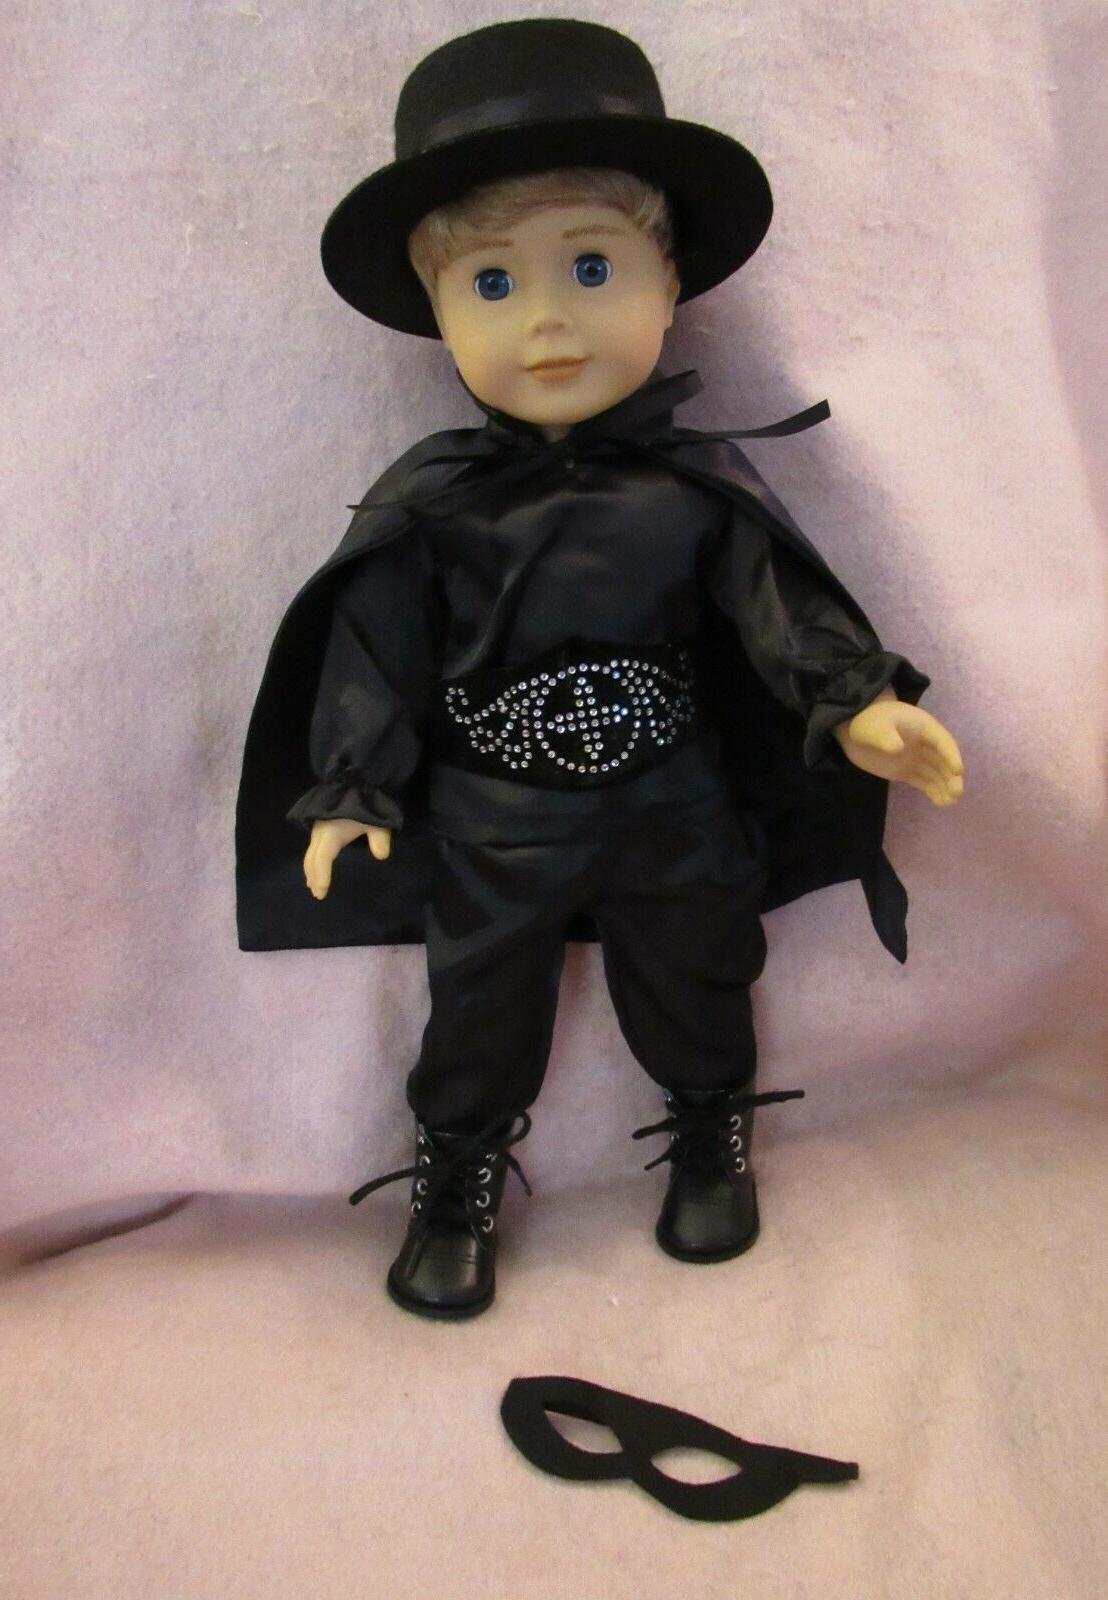 Zorro Set fits Boy Clothes Seller